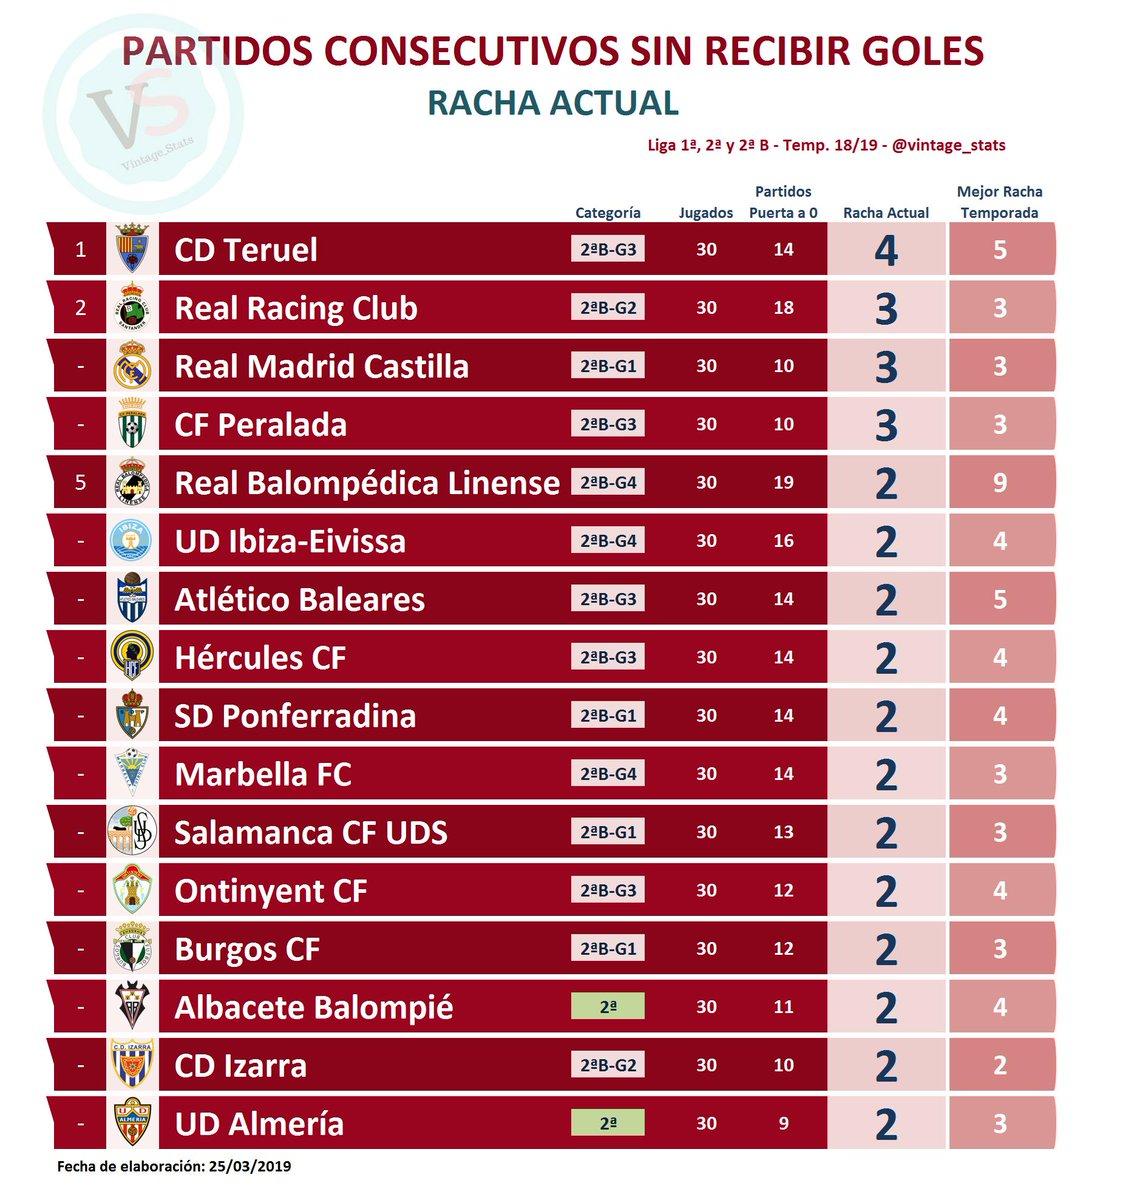 ⚽️⛔️🥅 #Dato Liga 1ª, 2ª y 2ªB  🔸 RACHA ACTUAL DE PARTIDOS CONSECUTIVOS SIN RECIBIR GOLES:  [4] @TeruelCd  [3] @realracingclub [3] @lafabricacrm [3] @CFPeralada